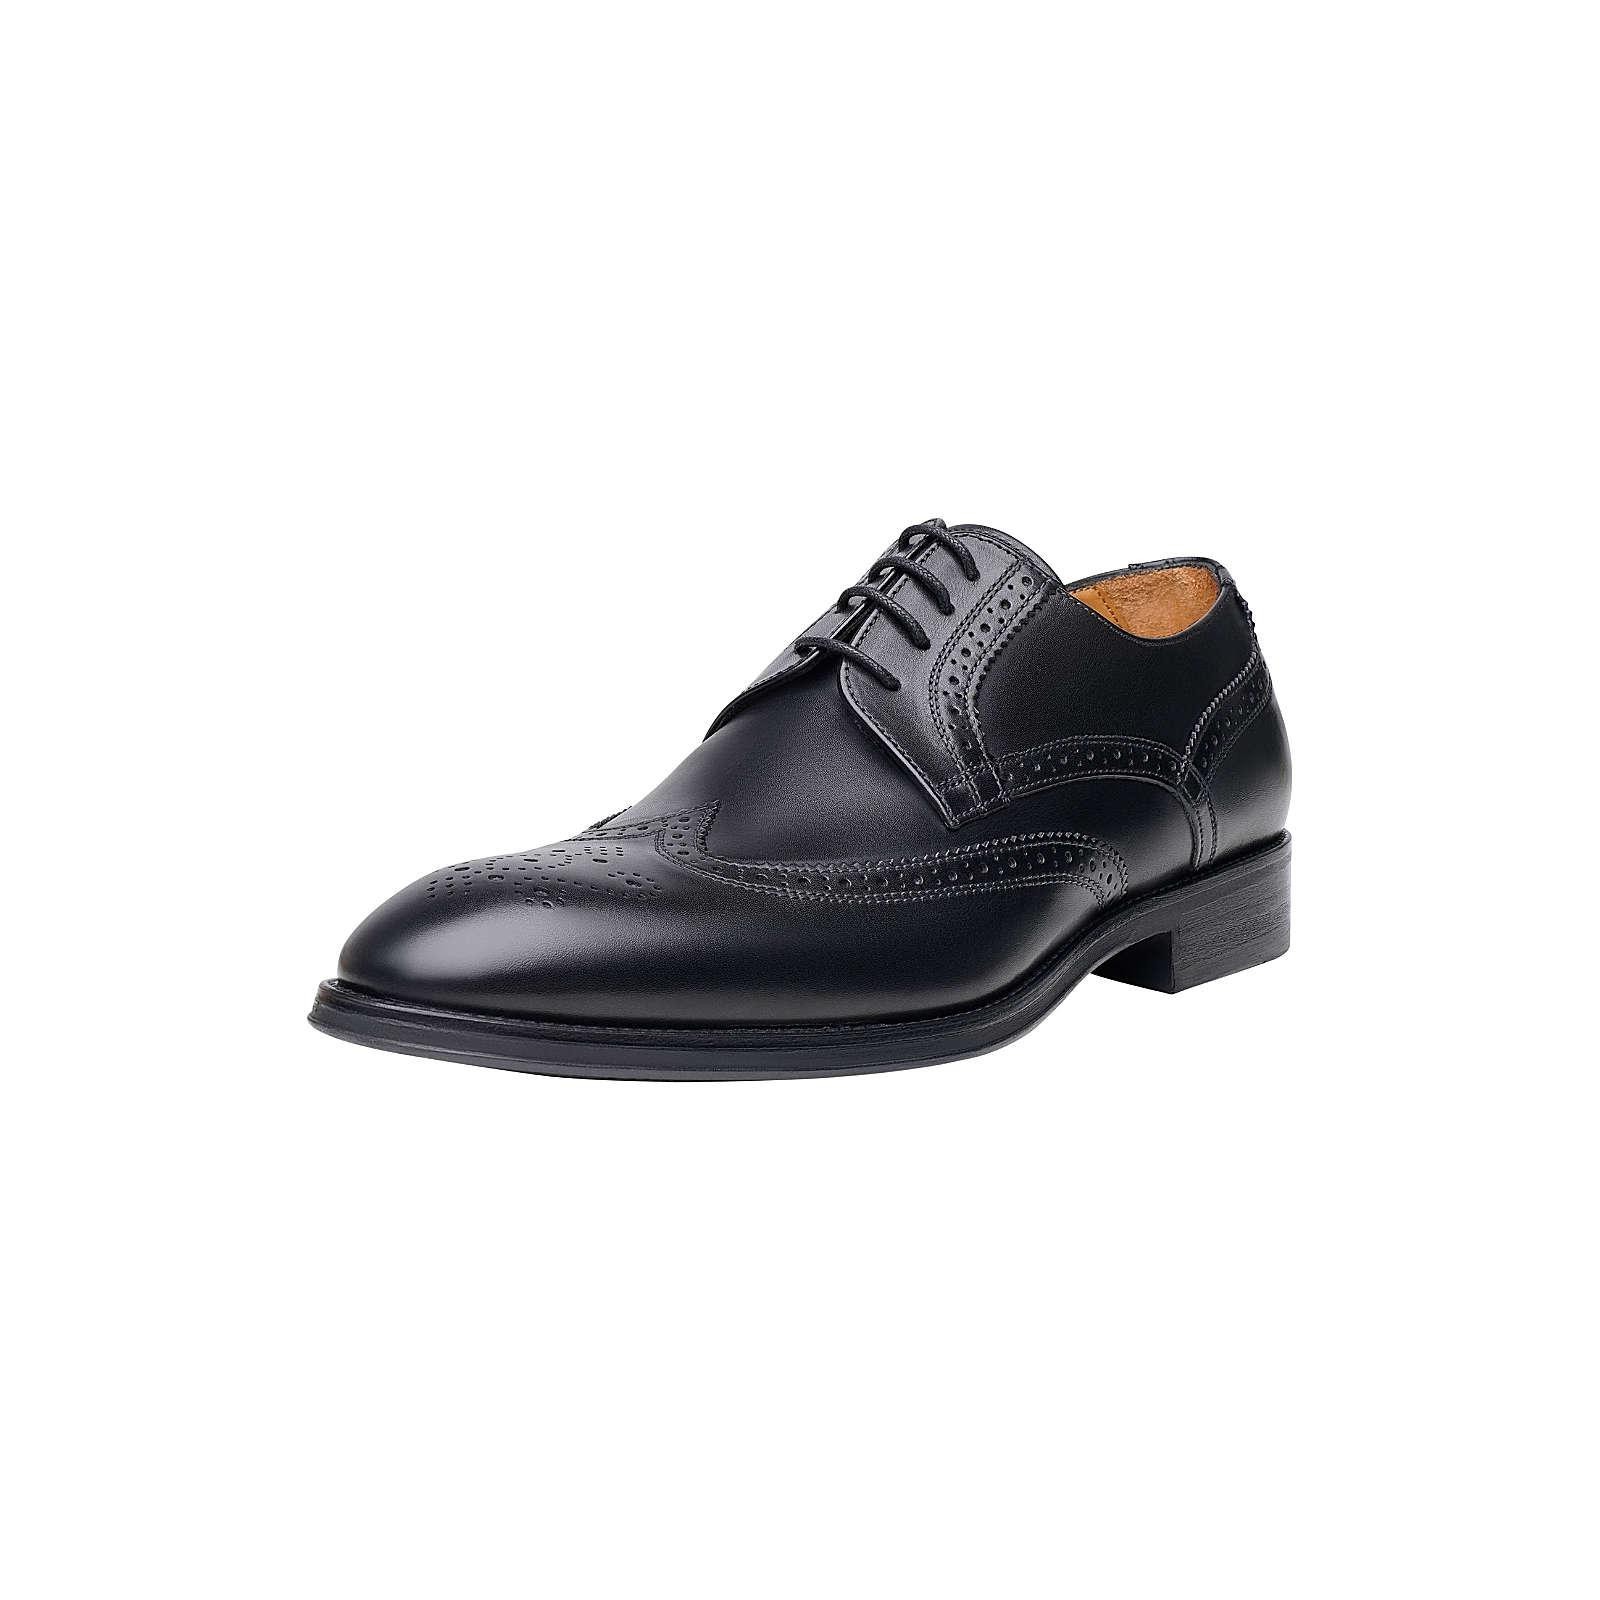 Shoepassion Halbschuhe No. 506 SC Business-Schnürschuhe schwarz Herren Gr. 40,5